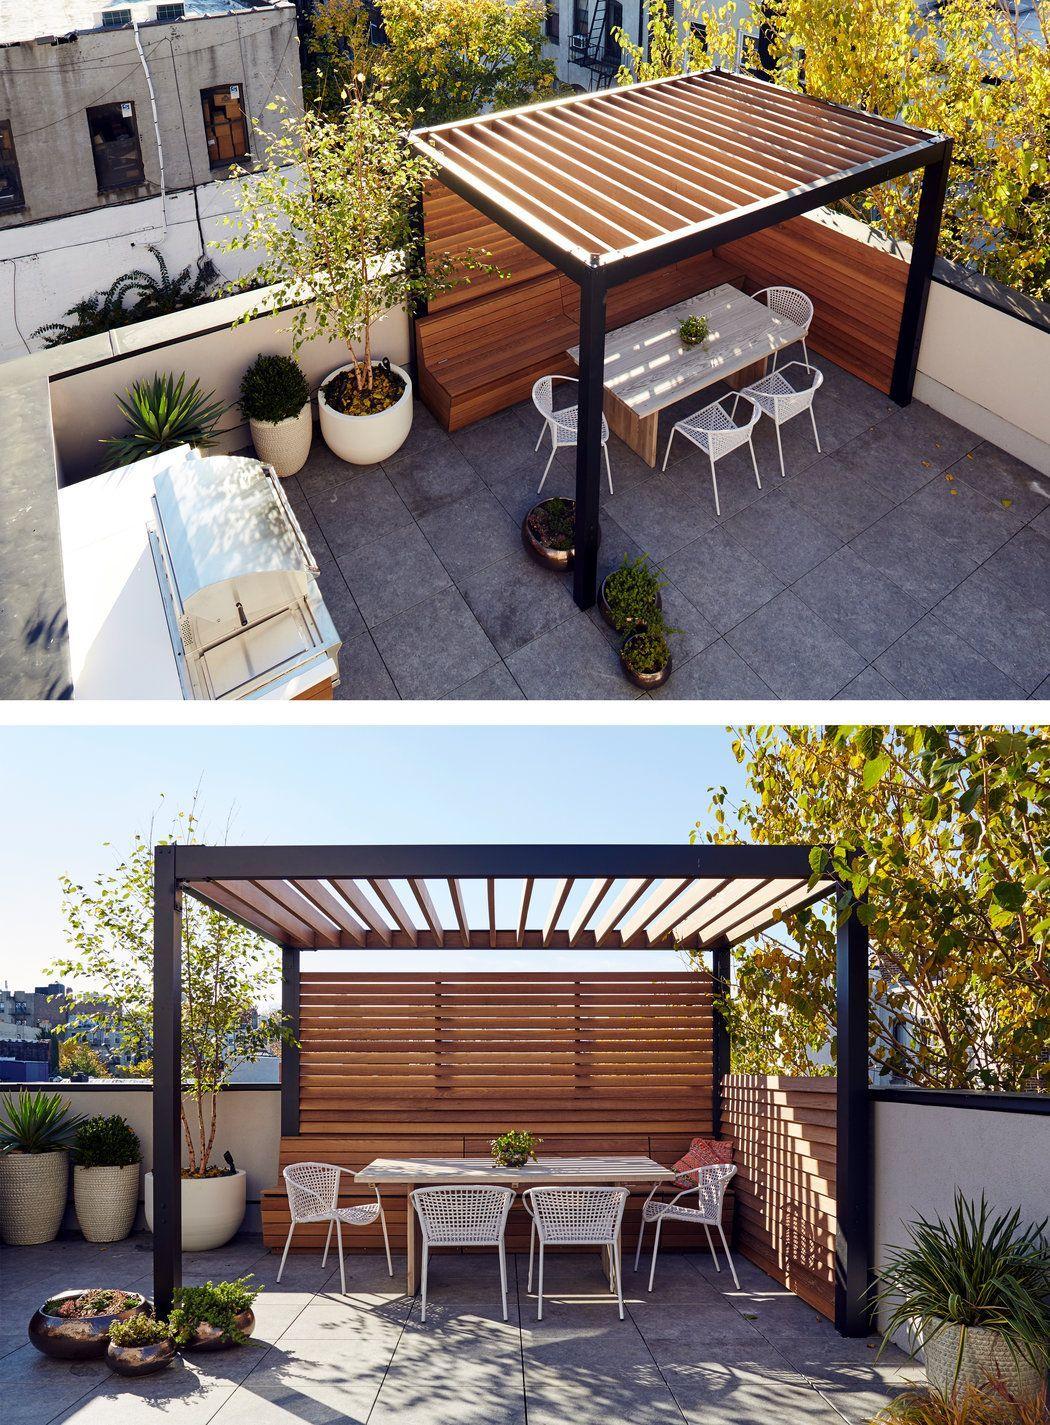 Balcony Garden Ideas Diy Privacy Screens